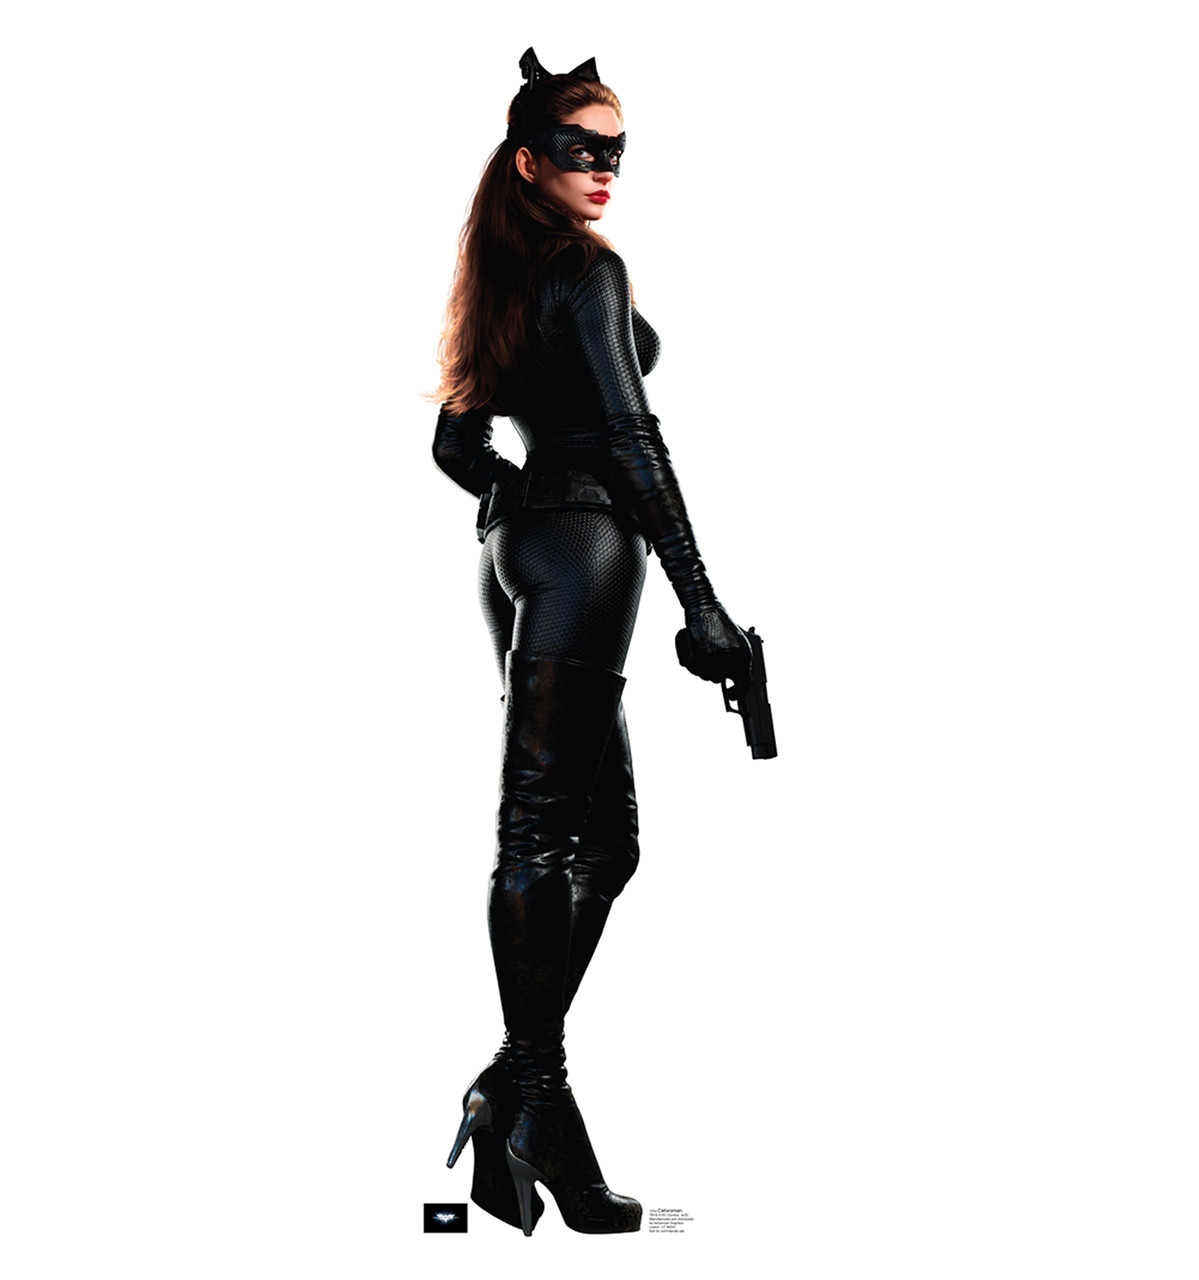 Catwoman - Cardboard Cutout